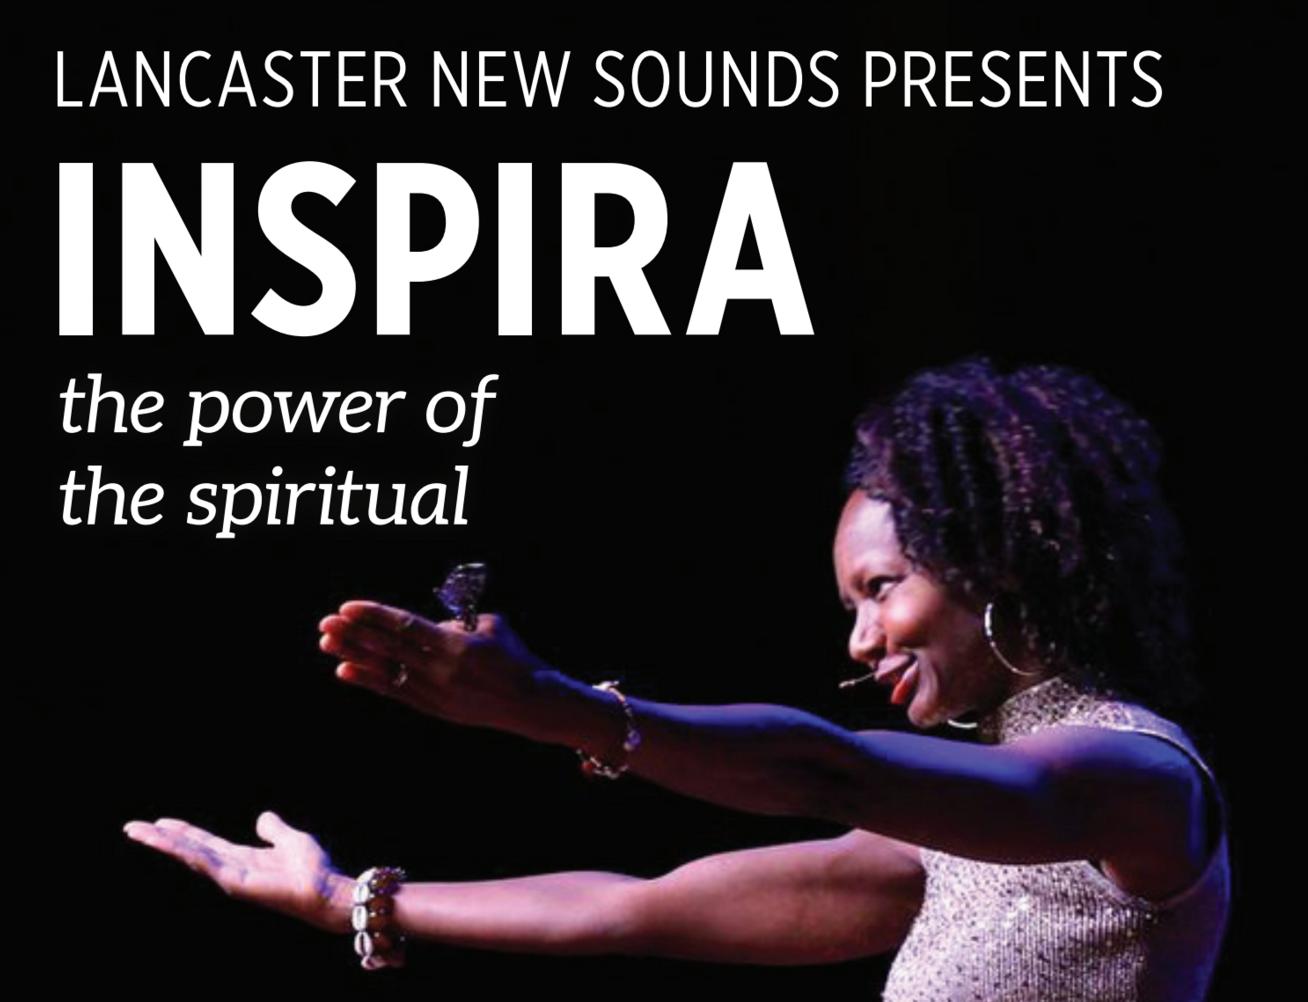 Lancaster New Sounds Presents Inspira: Power of the Spiritual